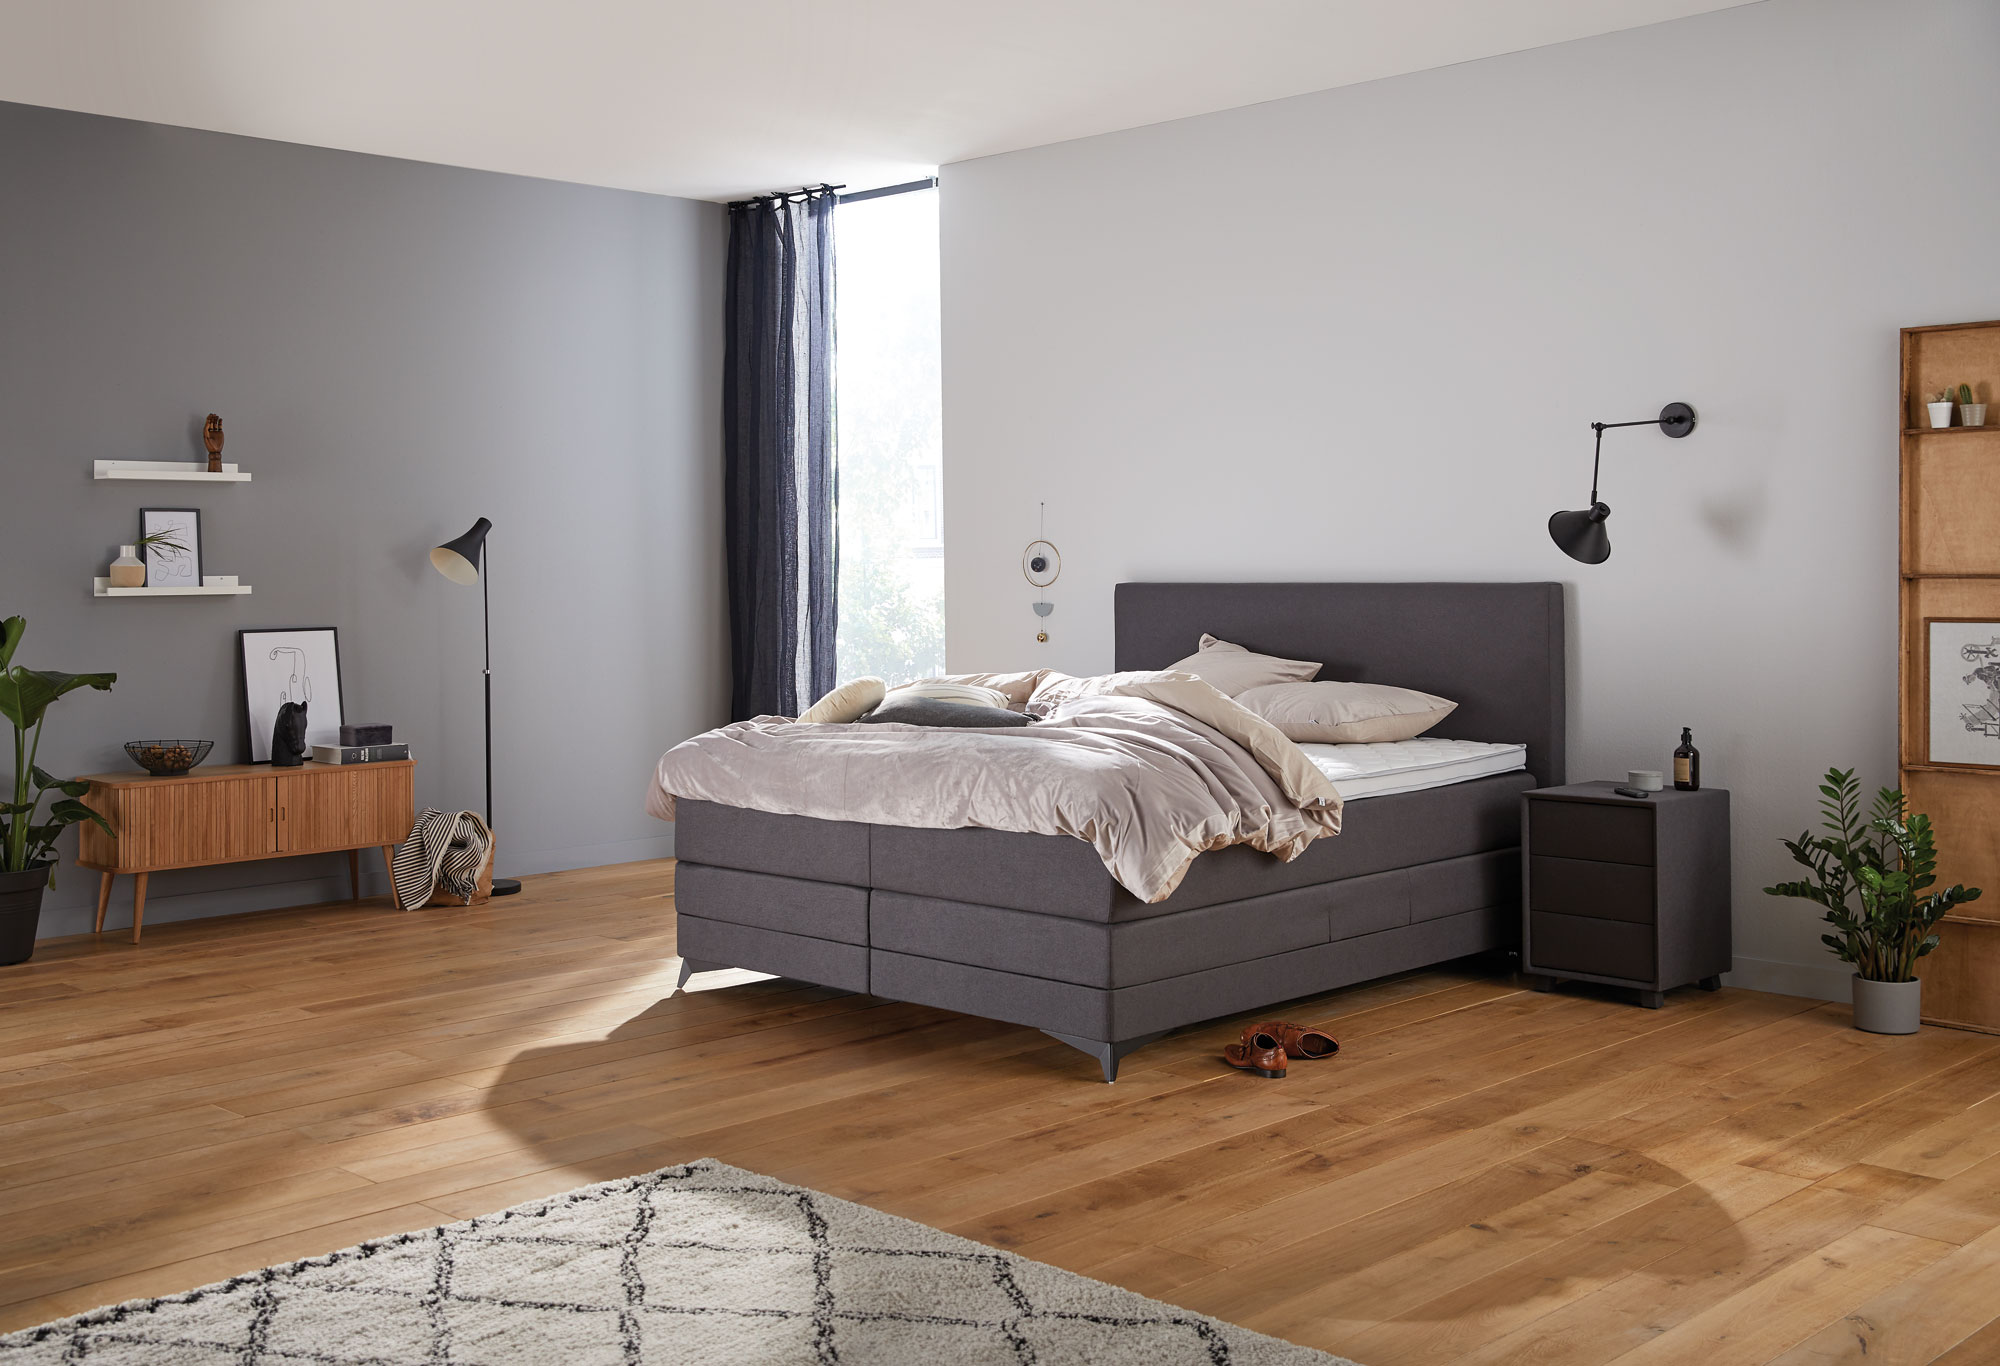 Boxspringbett Home 405n - schnell lieferbar | Swiss Sense